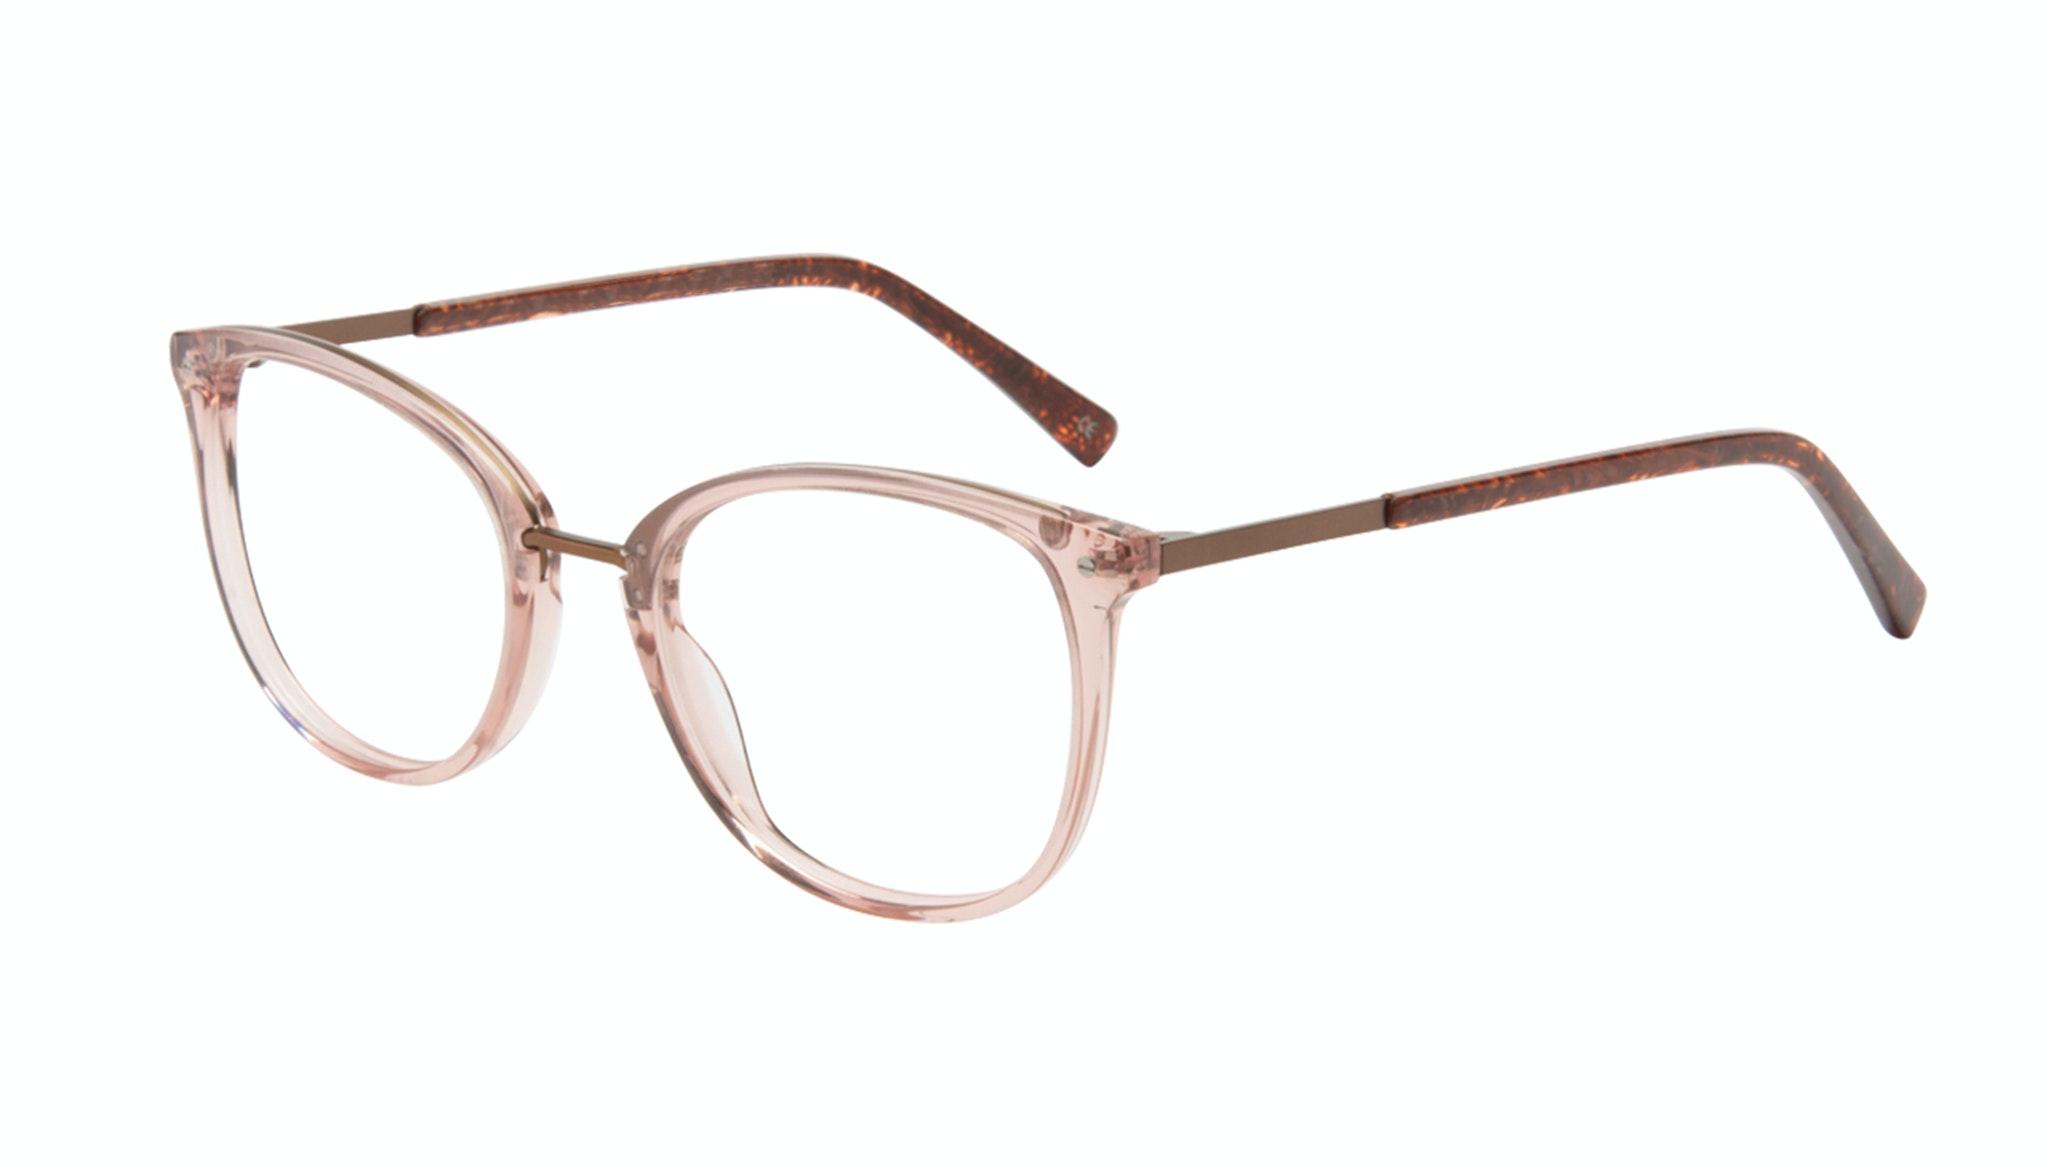 Affordable Fashion Glasses Square Round Eyeglasses Women Bella Rose Tilt